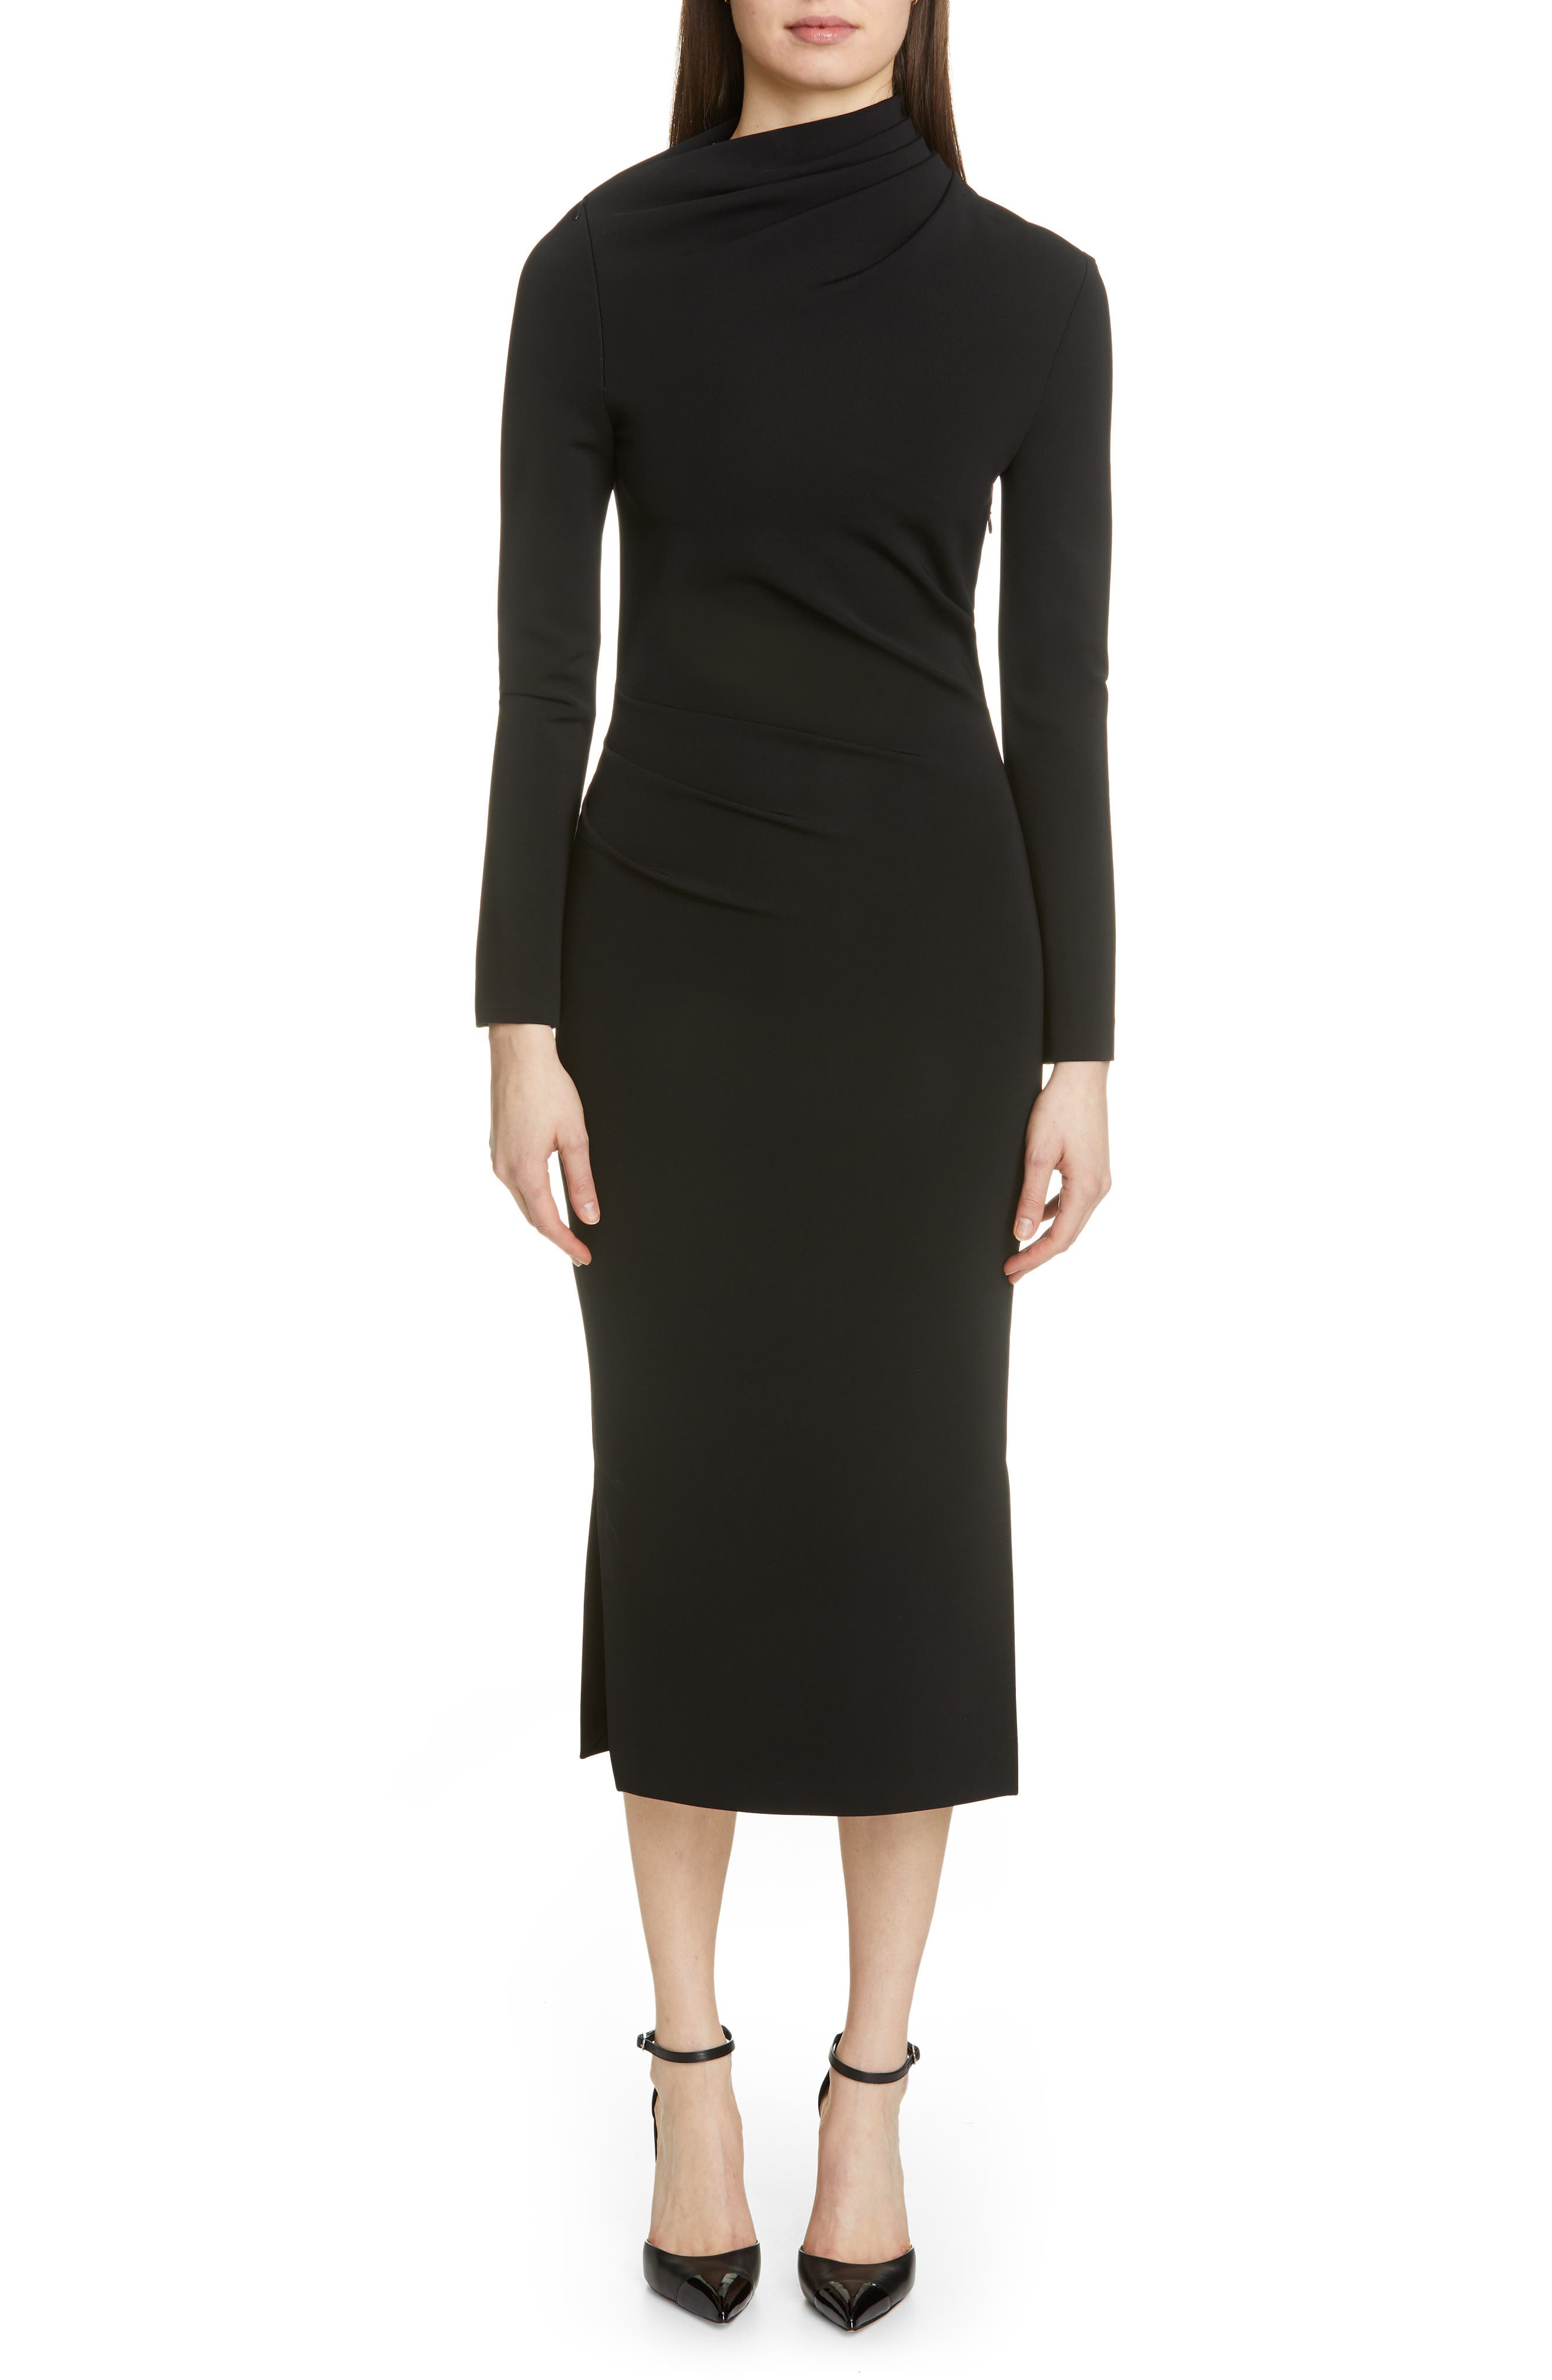 BRANDON MAXWELL, Side Drape Jersey Dress, Main thumbnail 1, color, BLACK